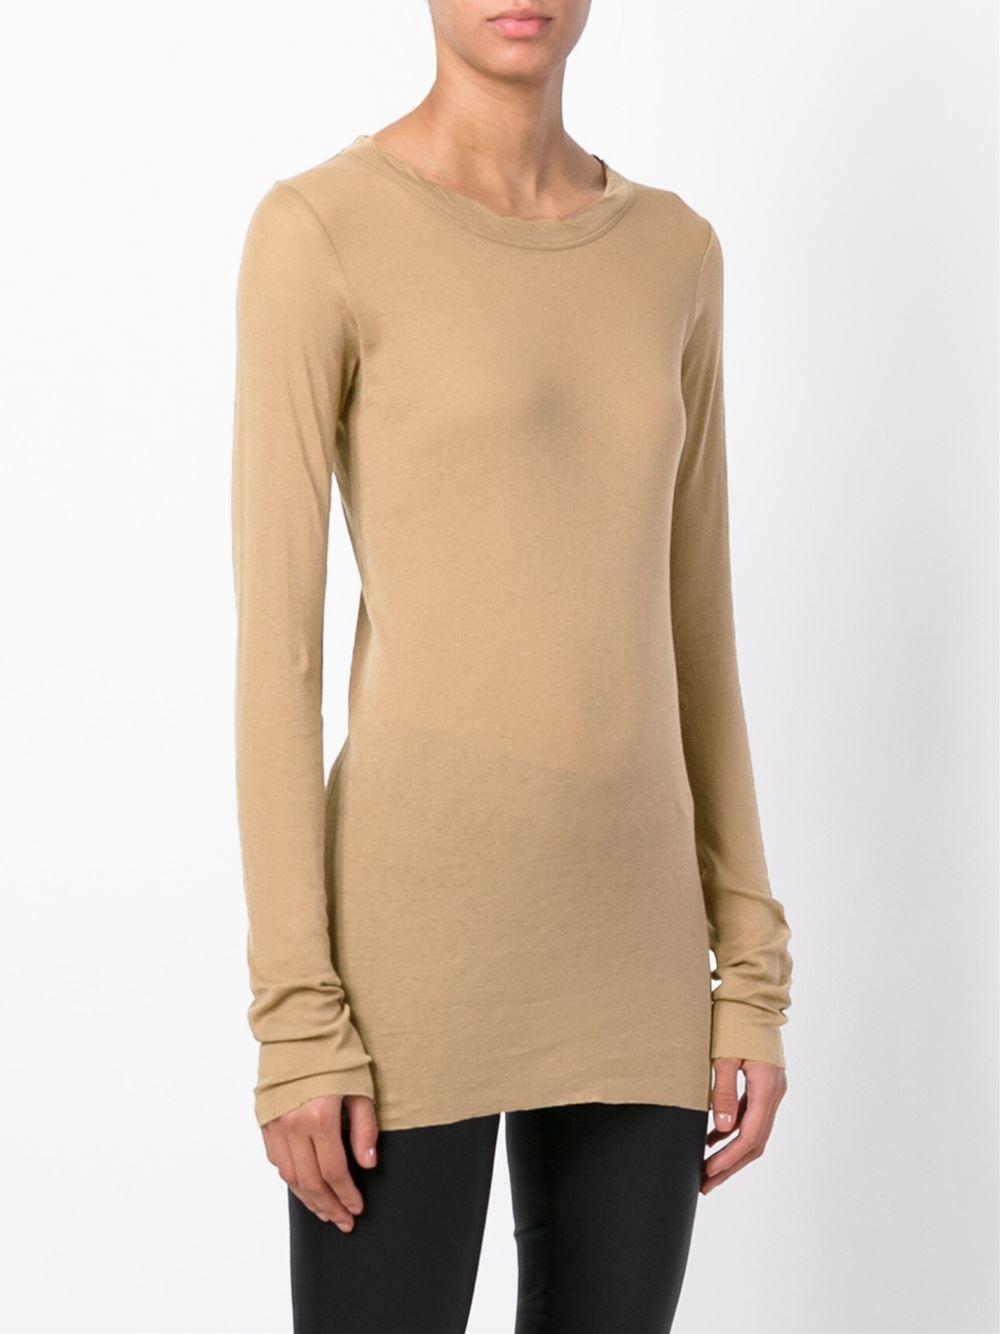 Rick owens scoop neck t shirt in beige brown lyst for Scoop neck t shirt